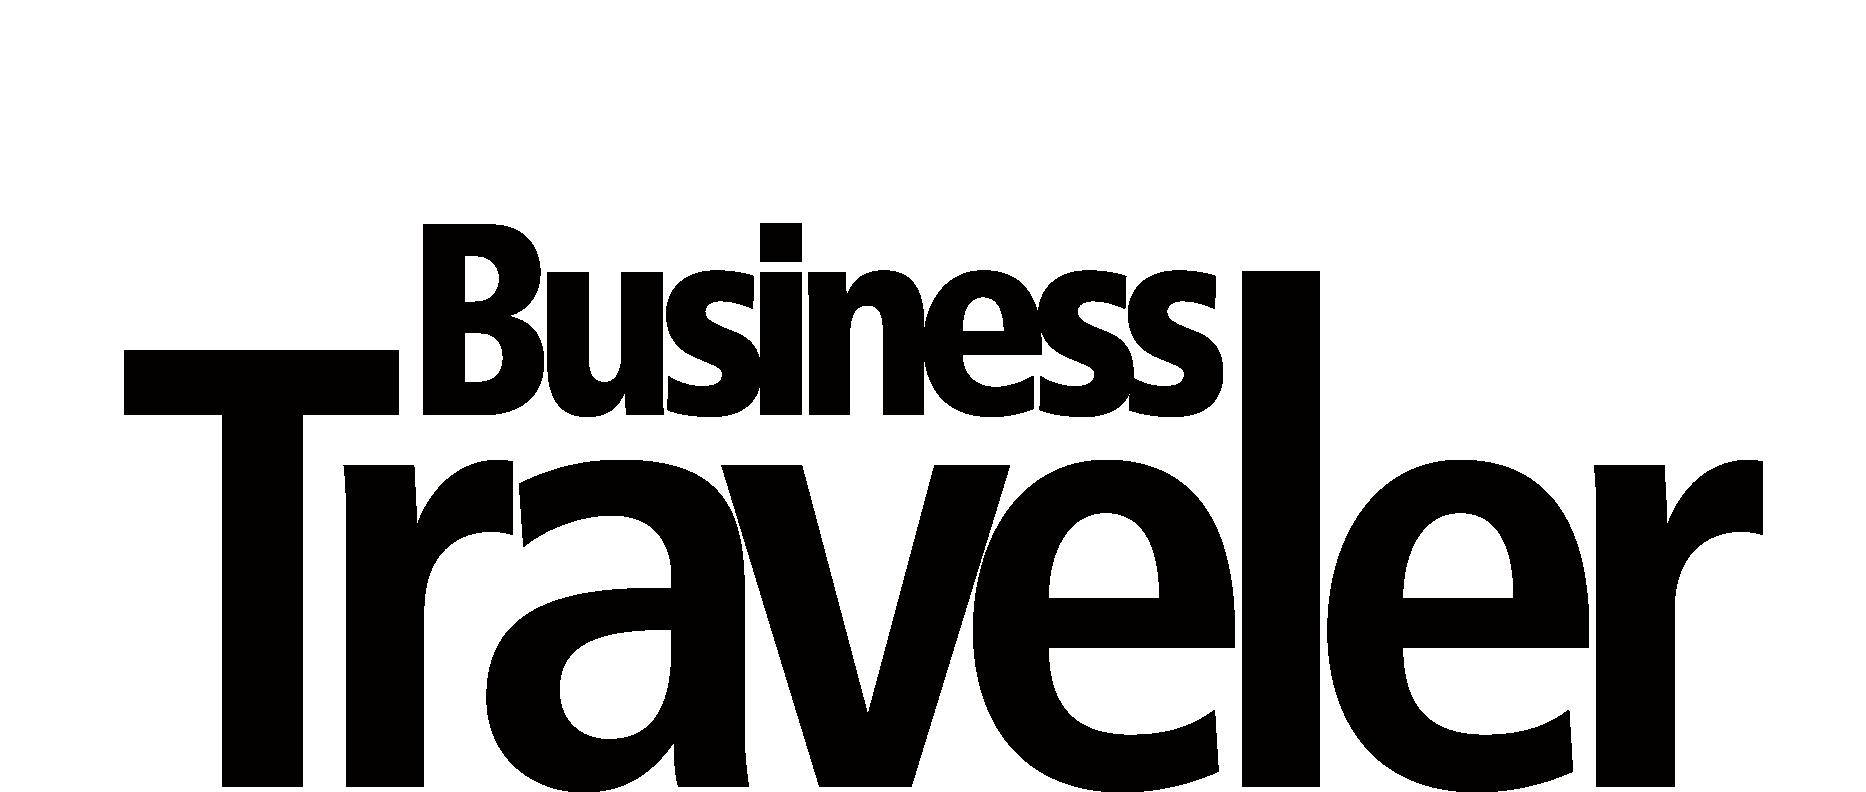 https://cdn.sitemaya.com/wp-content/uploads/sites/98/2021/09/23093131/businesstraveler_c.png